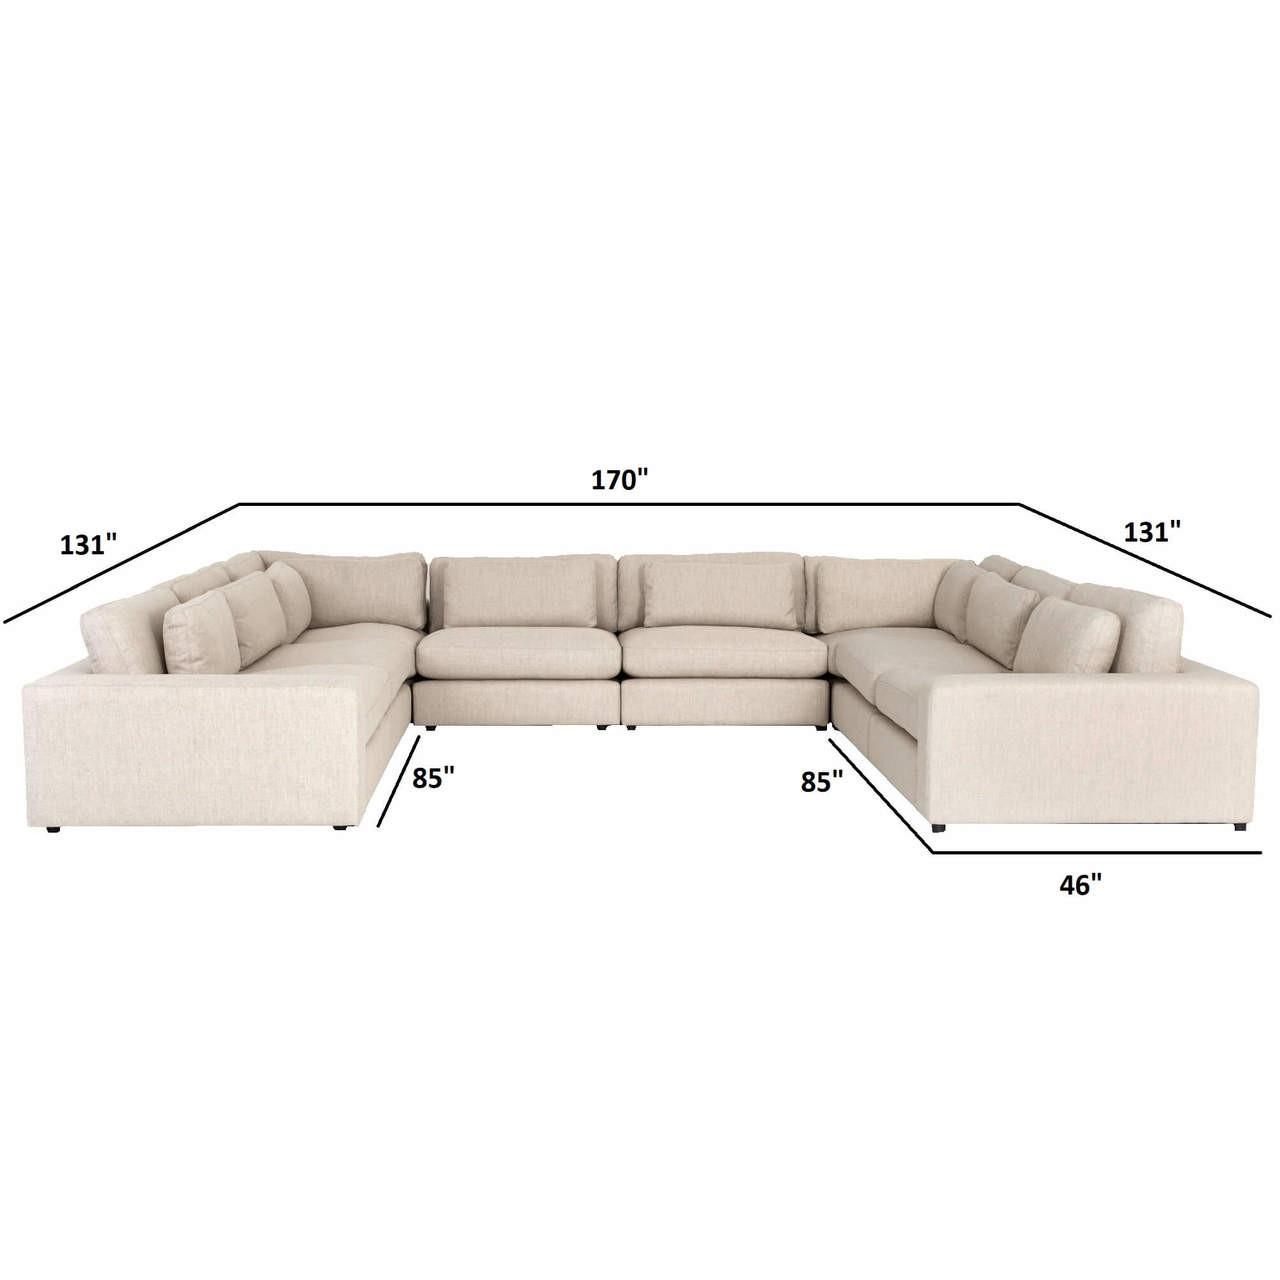 Magnificent Bloor Contemporary Beige Linen 8 Piece U Shaped Sectional Sofa Alphanode Cool Chair Designs And Ideas Alphanodeonline